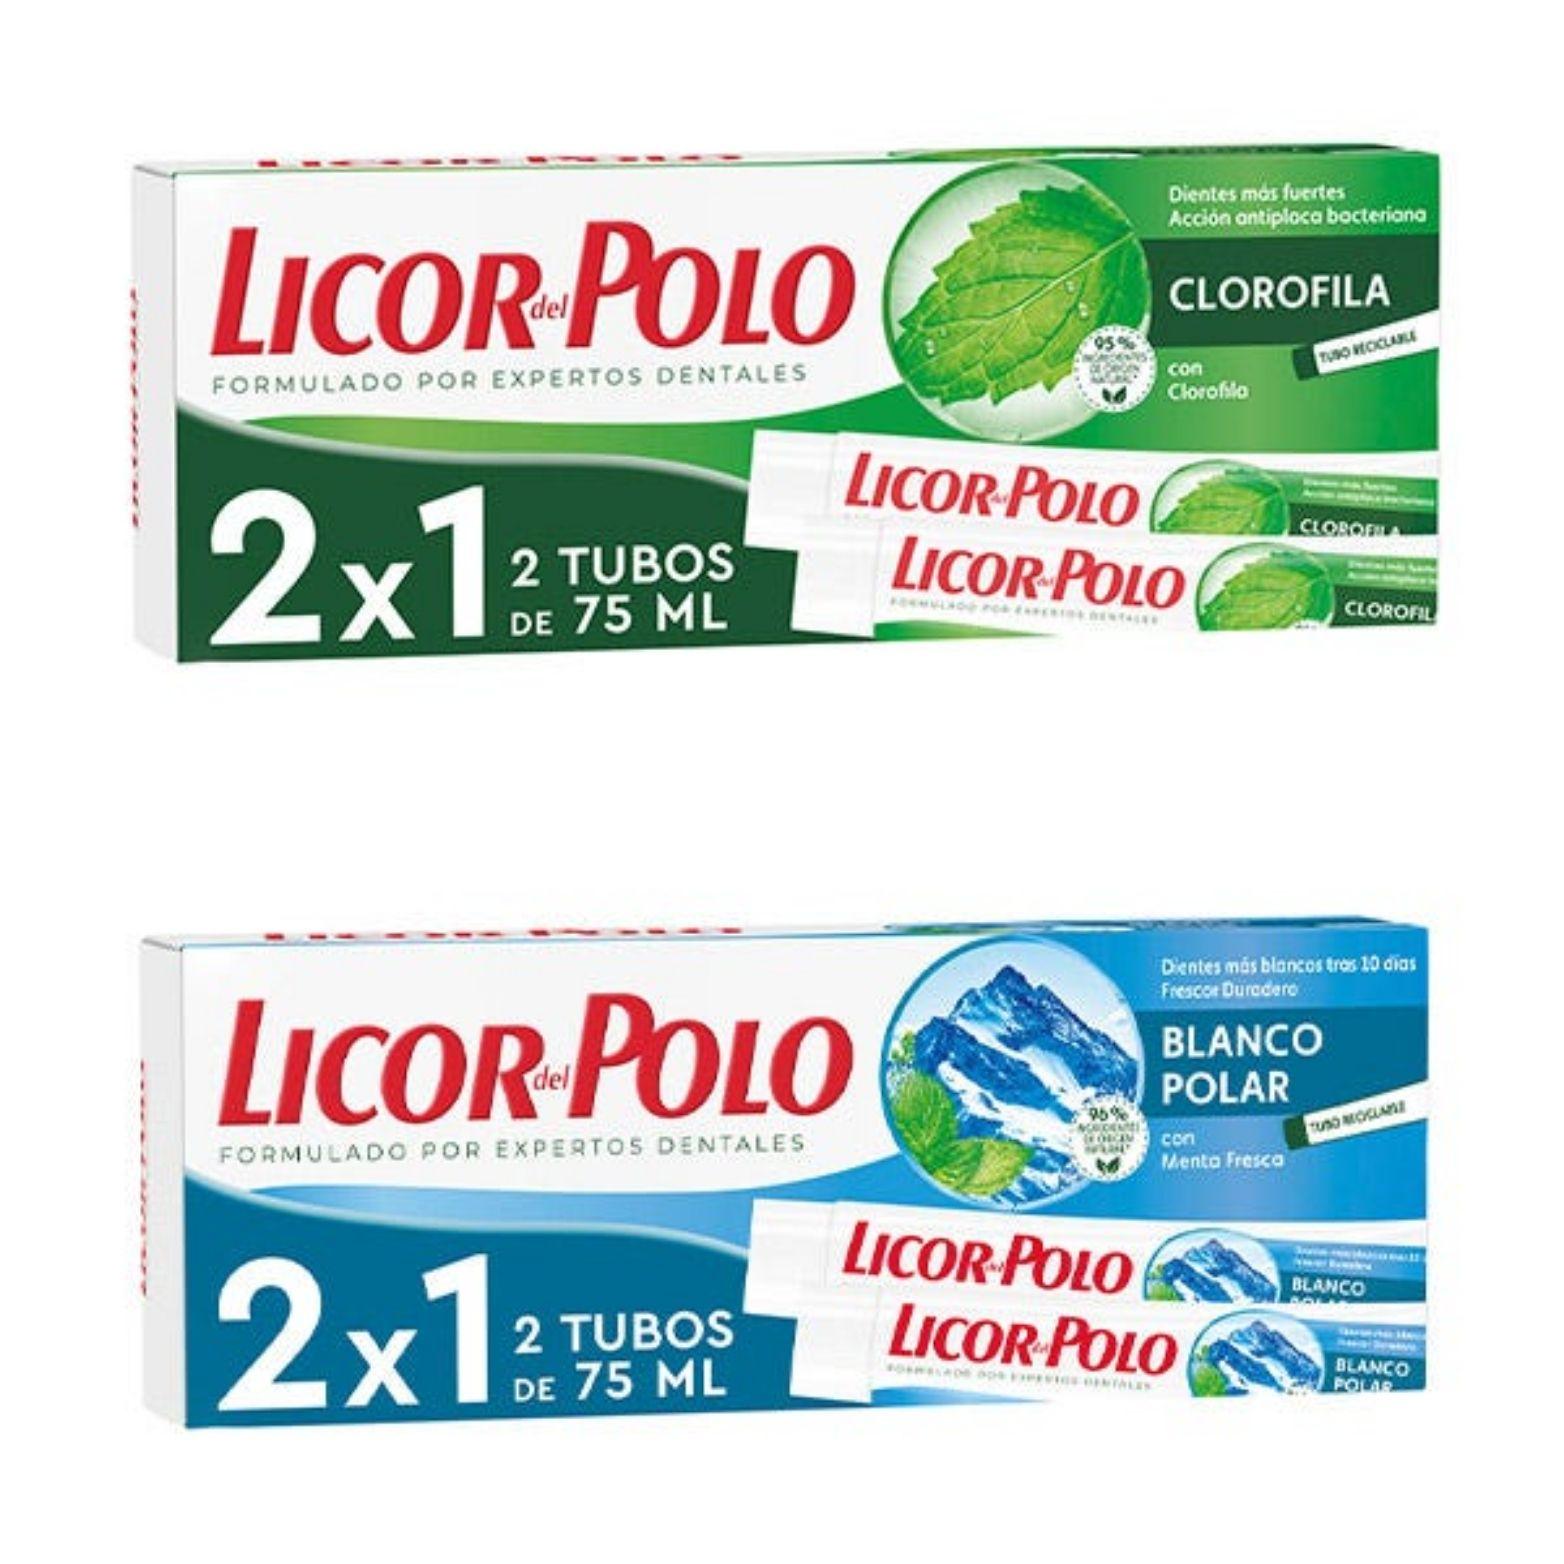 Pack 2 Pasta de Dientes Licor del Polo (Clorofila o Blanco Polar)